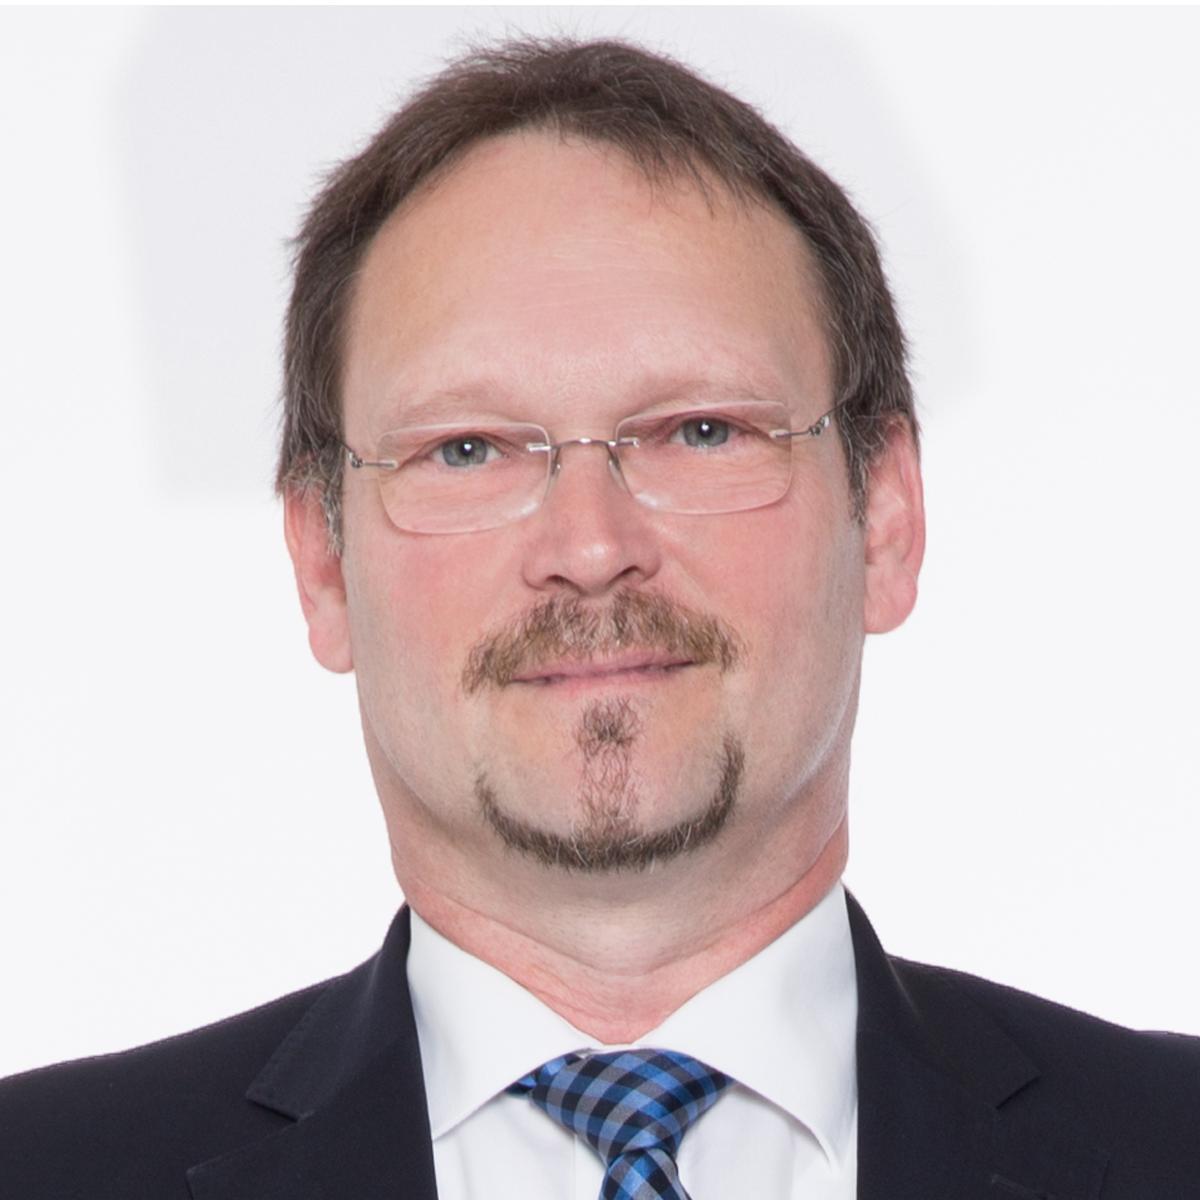 Dirk Jaede